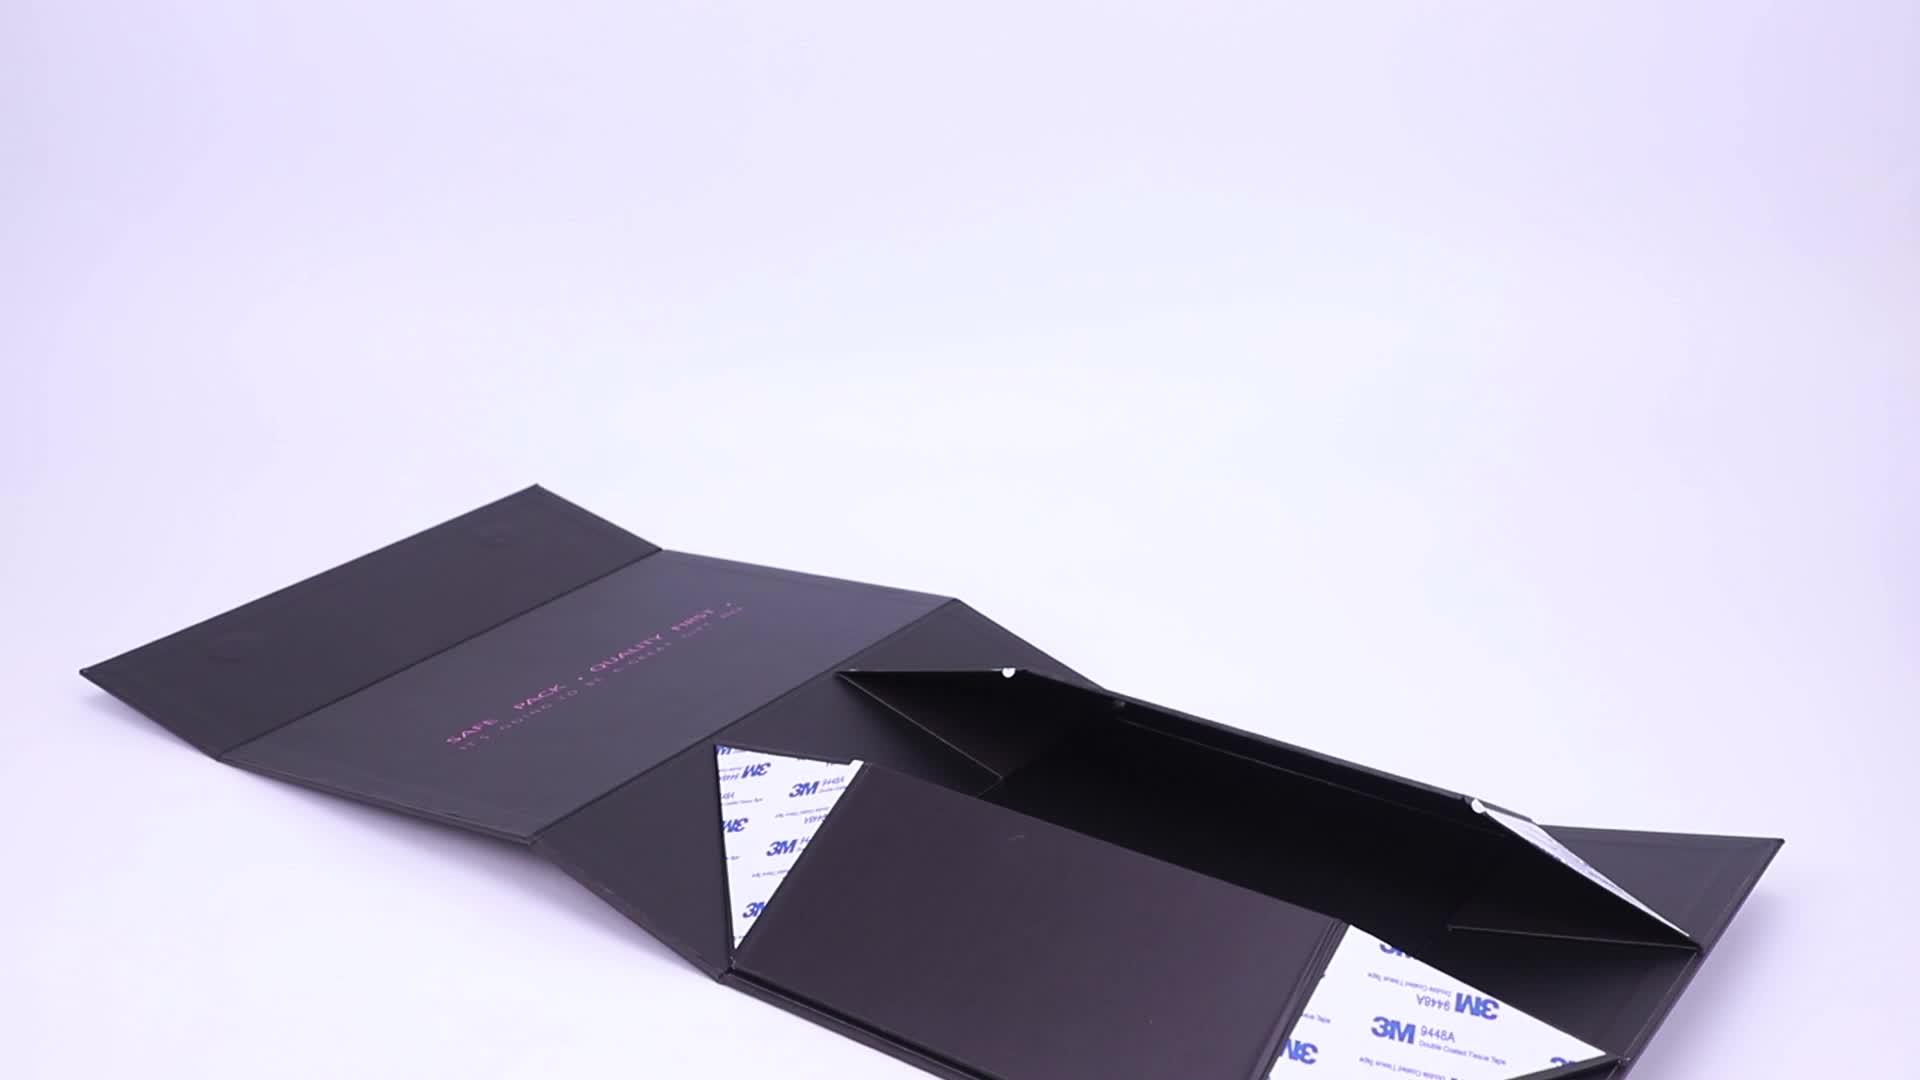 थोक खाली कस्टम लोगो मुद्रित काले फ्लैप ढक्कन हार्ड गत्ता कागज पैकेजिंग Foldable चुंबकीय बंद उपहार बॉक्स